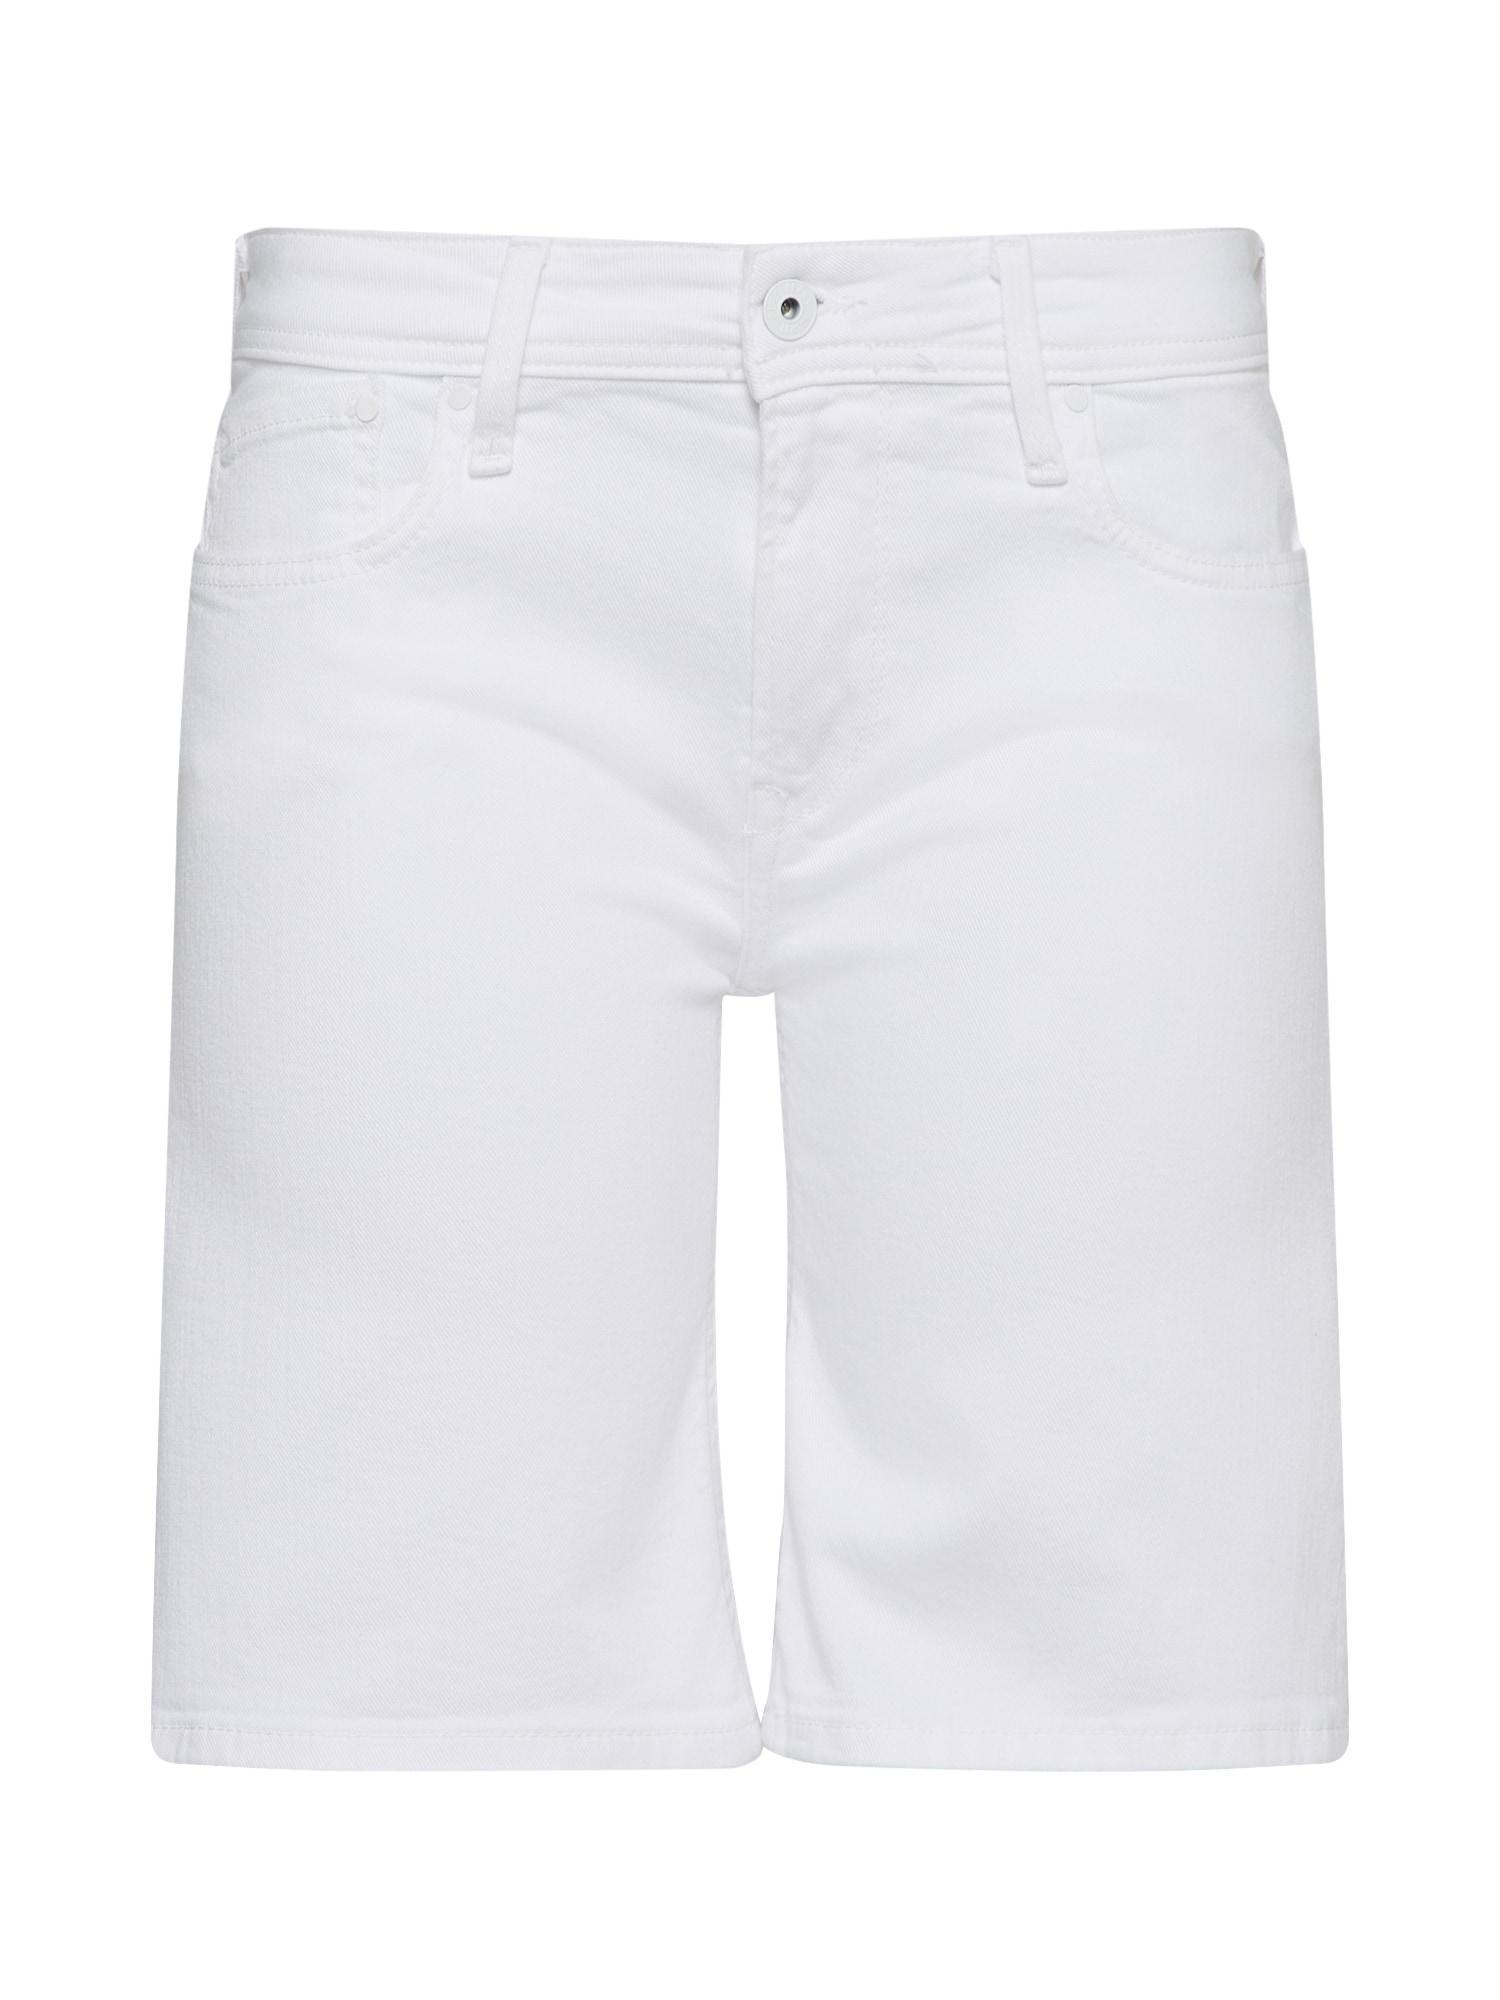 pepe jeans - Shorts aus Jeans ´Poppy´